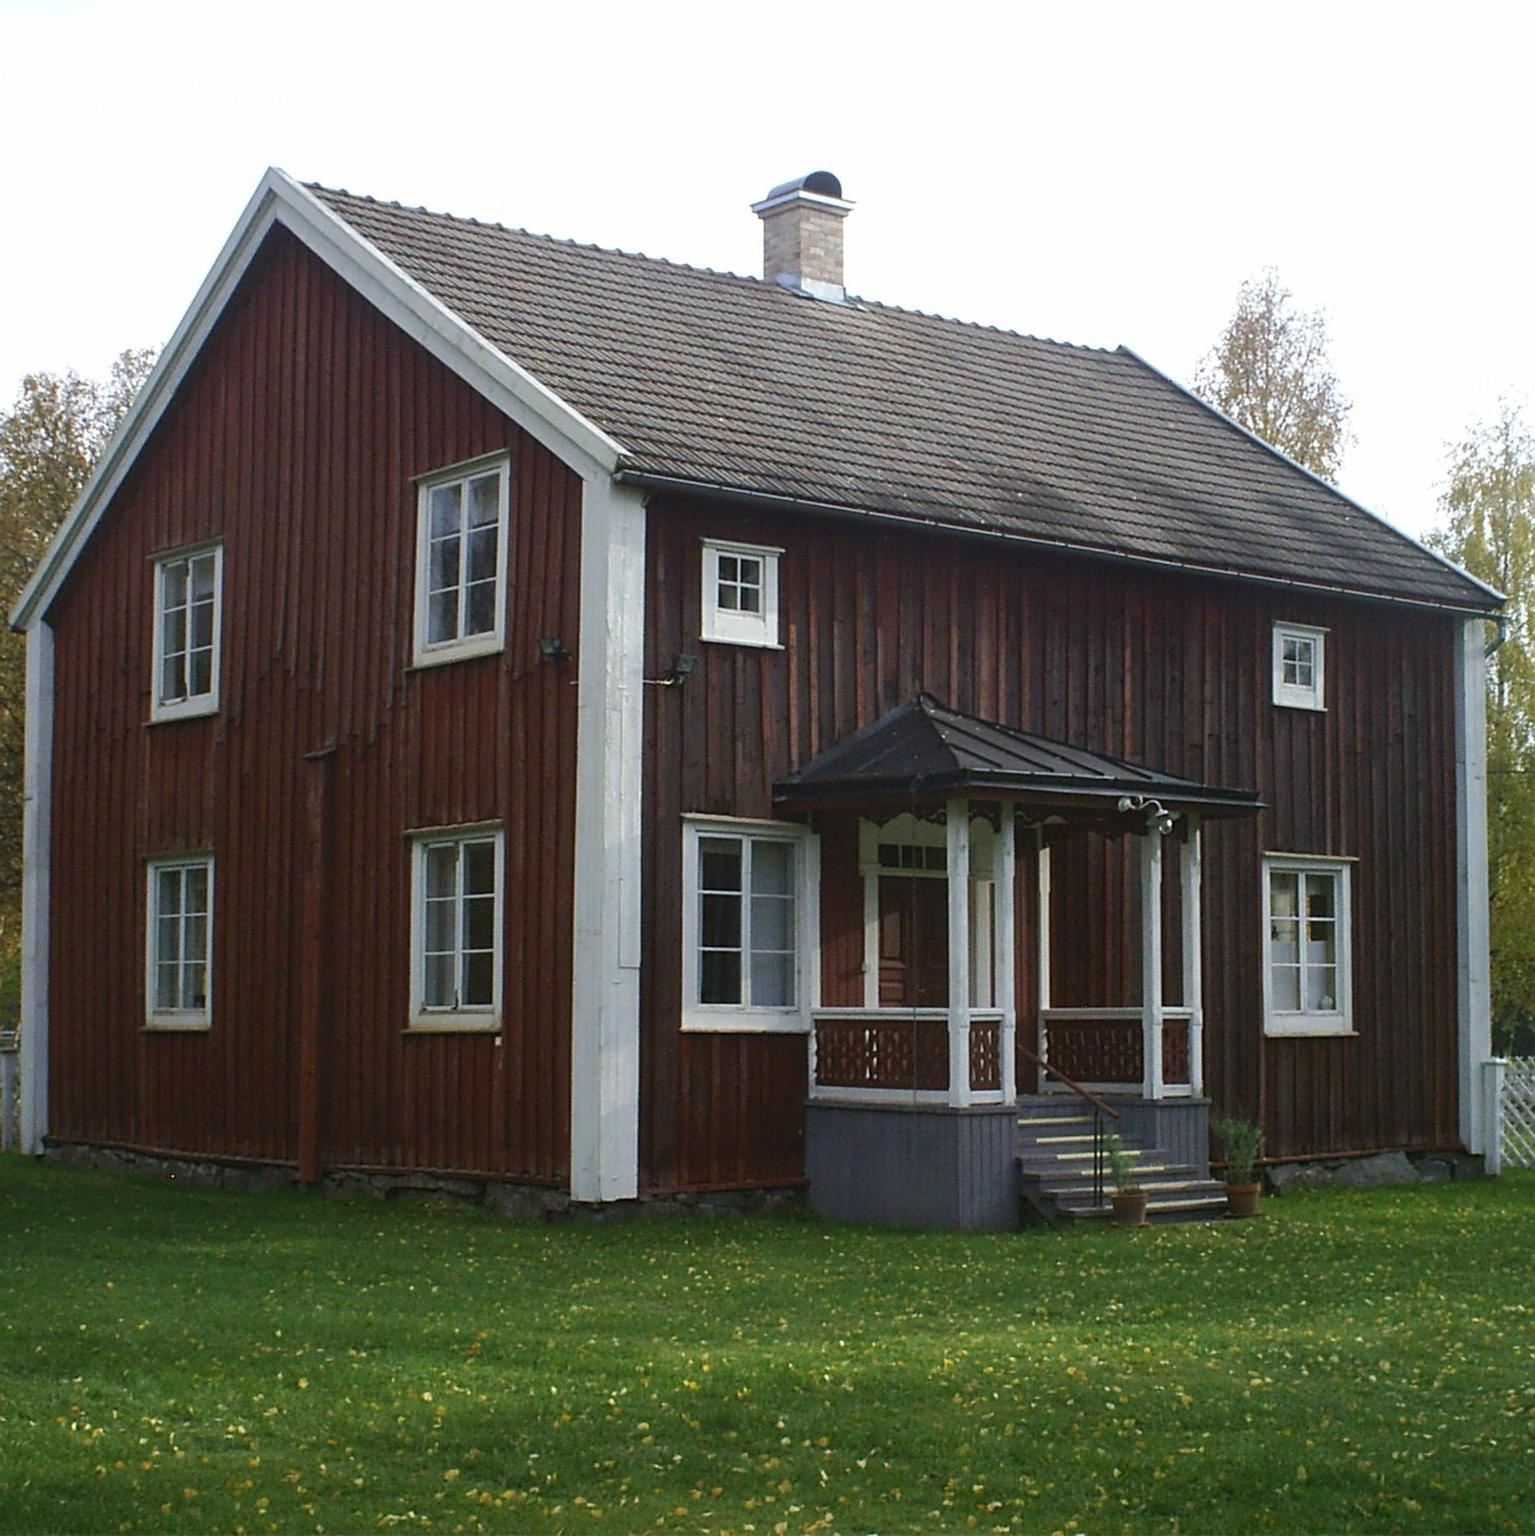 Foto:  P-O Sjödin, Ångermanlandsgården i Para